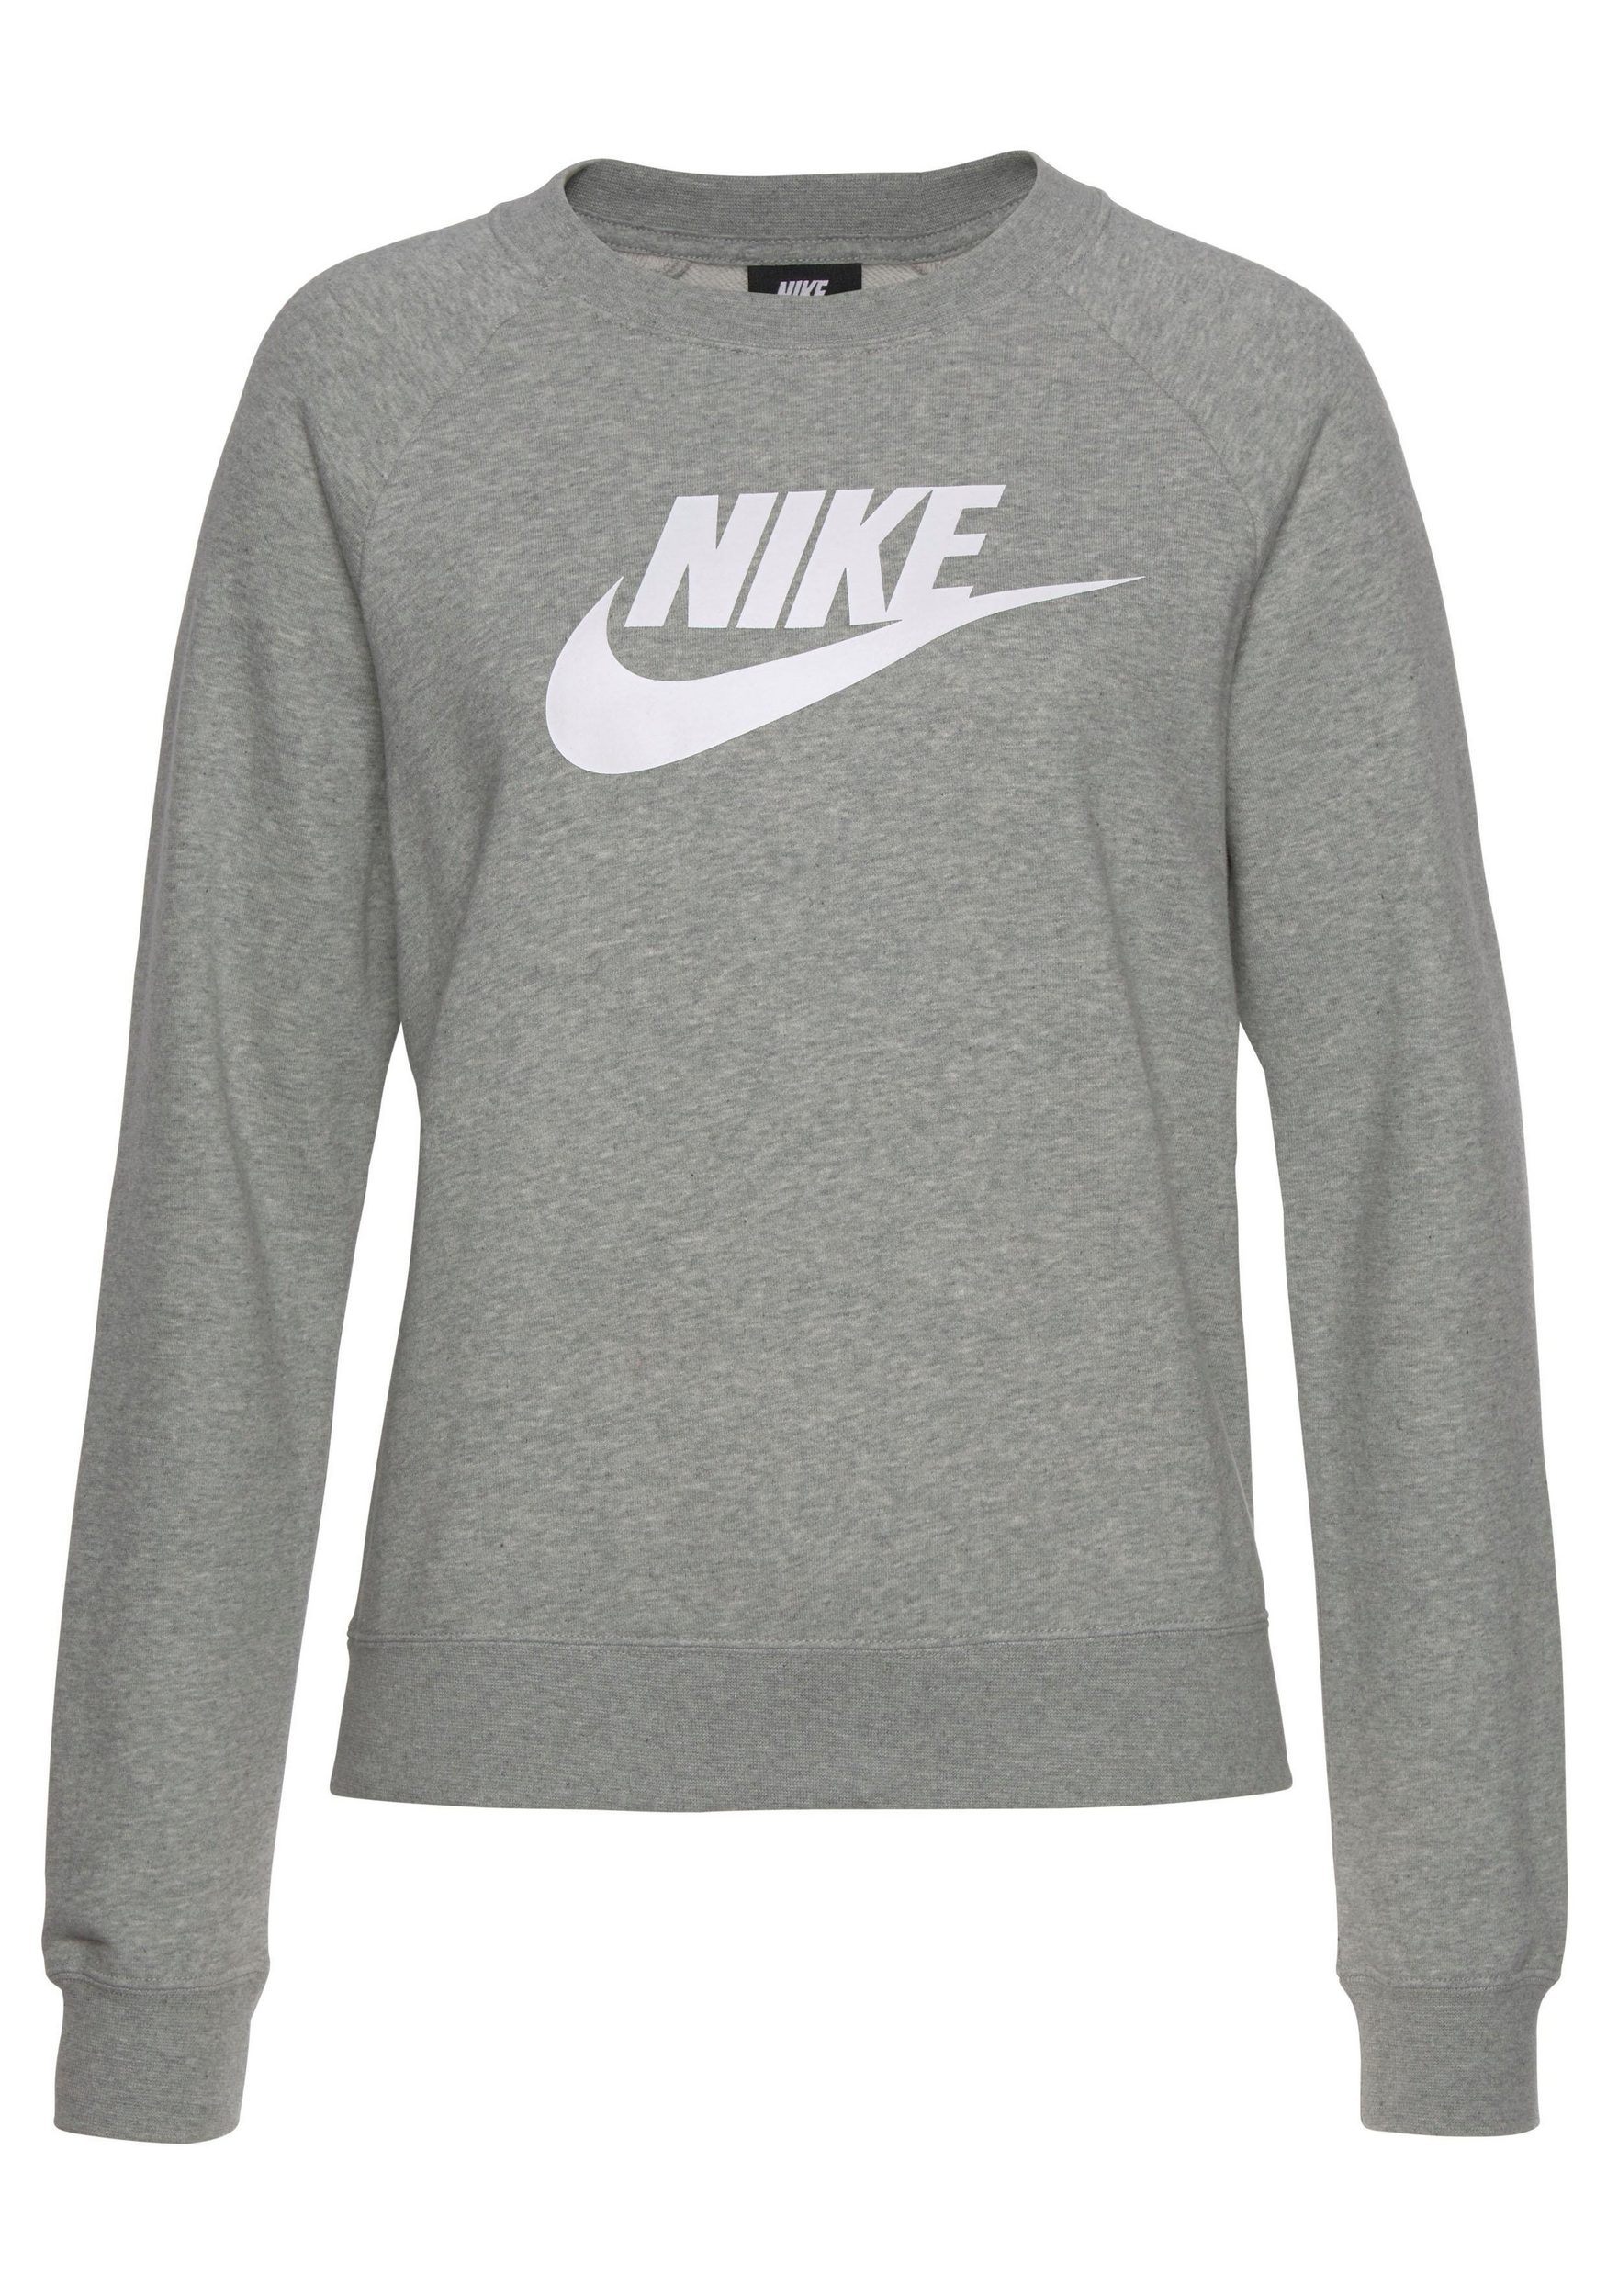 timeless design 30cde f2066 Nike Damen Essential Sweatshirt Pullover grau